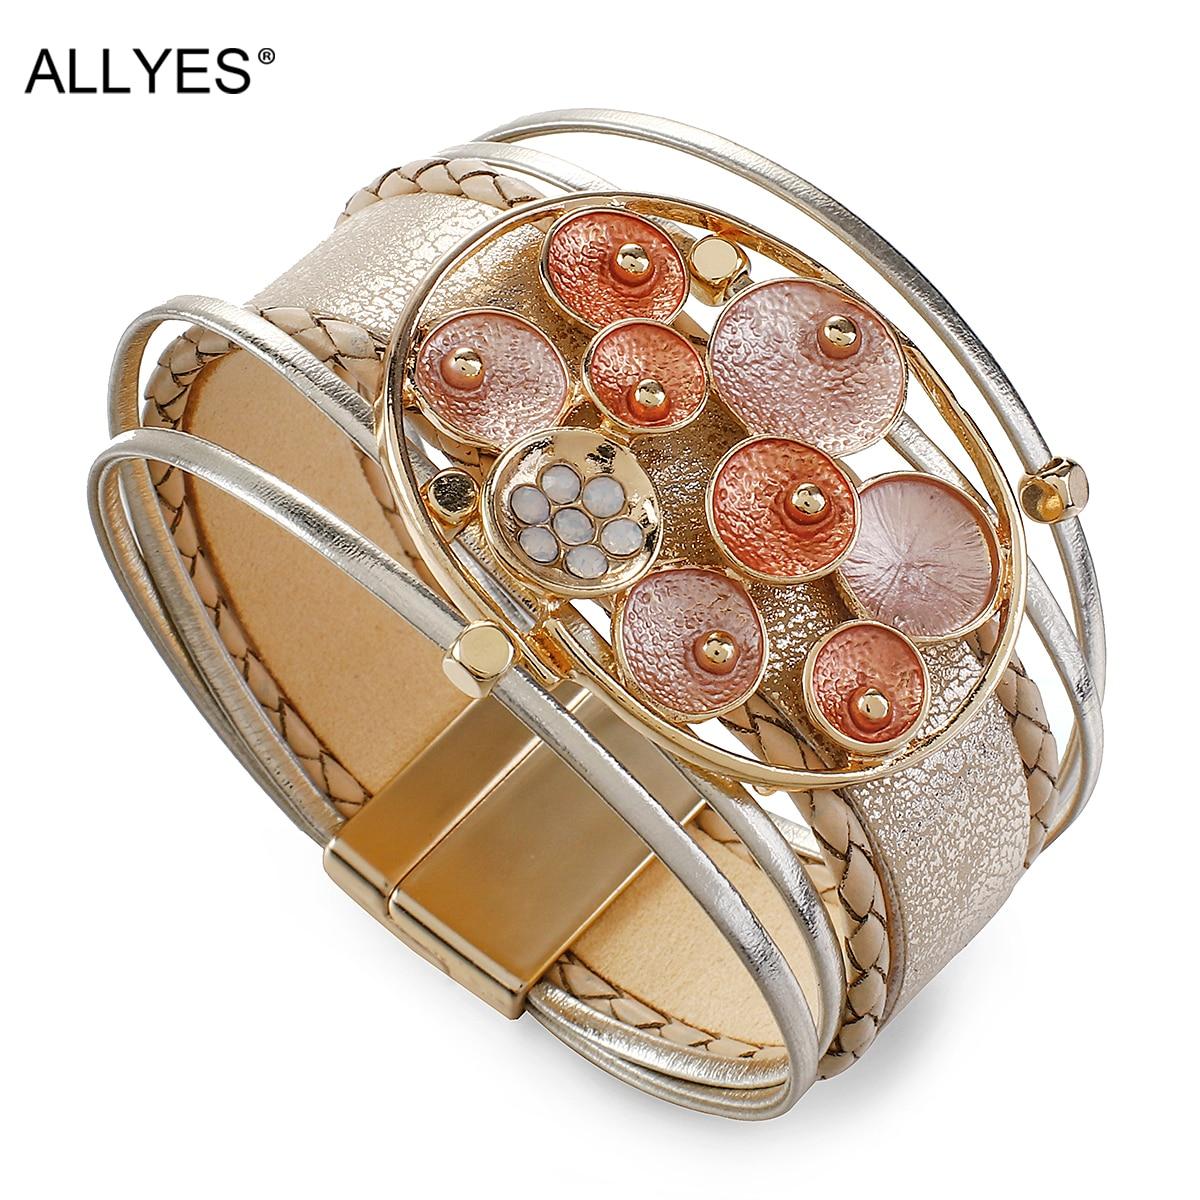 ALLYES Chunky Big Metal Enamel Charm Leather Bracelet for Women Boho Multilayer Braided Wide Wrap Bracelets Fashion Jewelry(China)